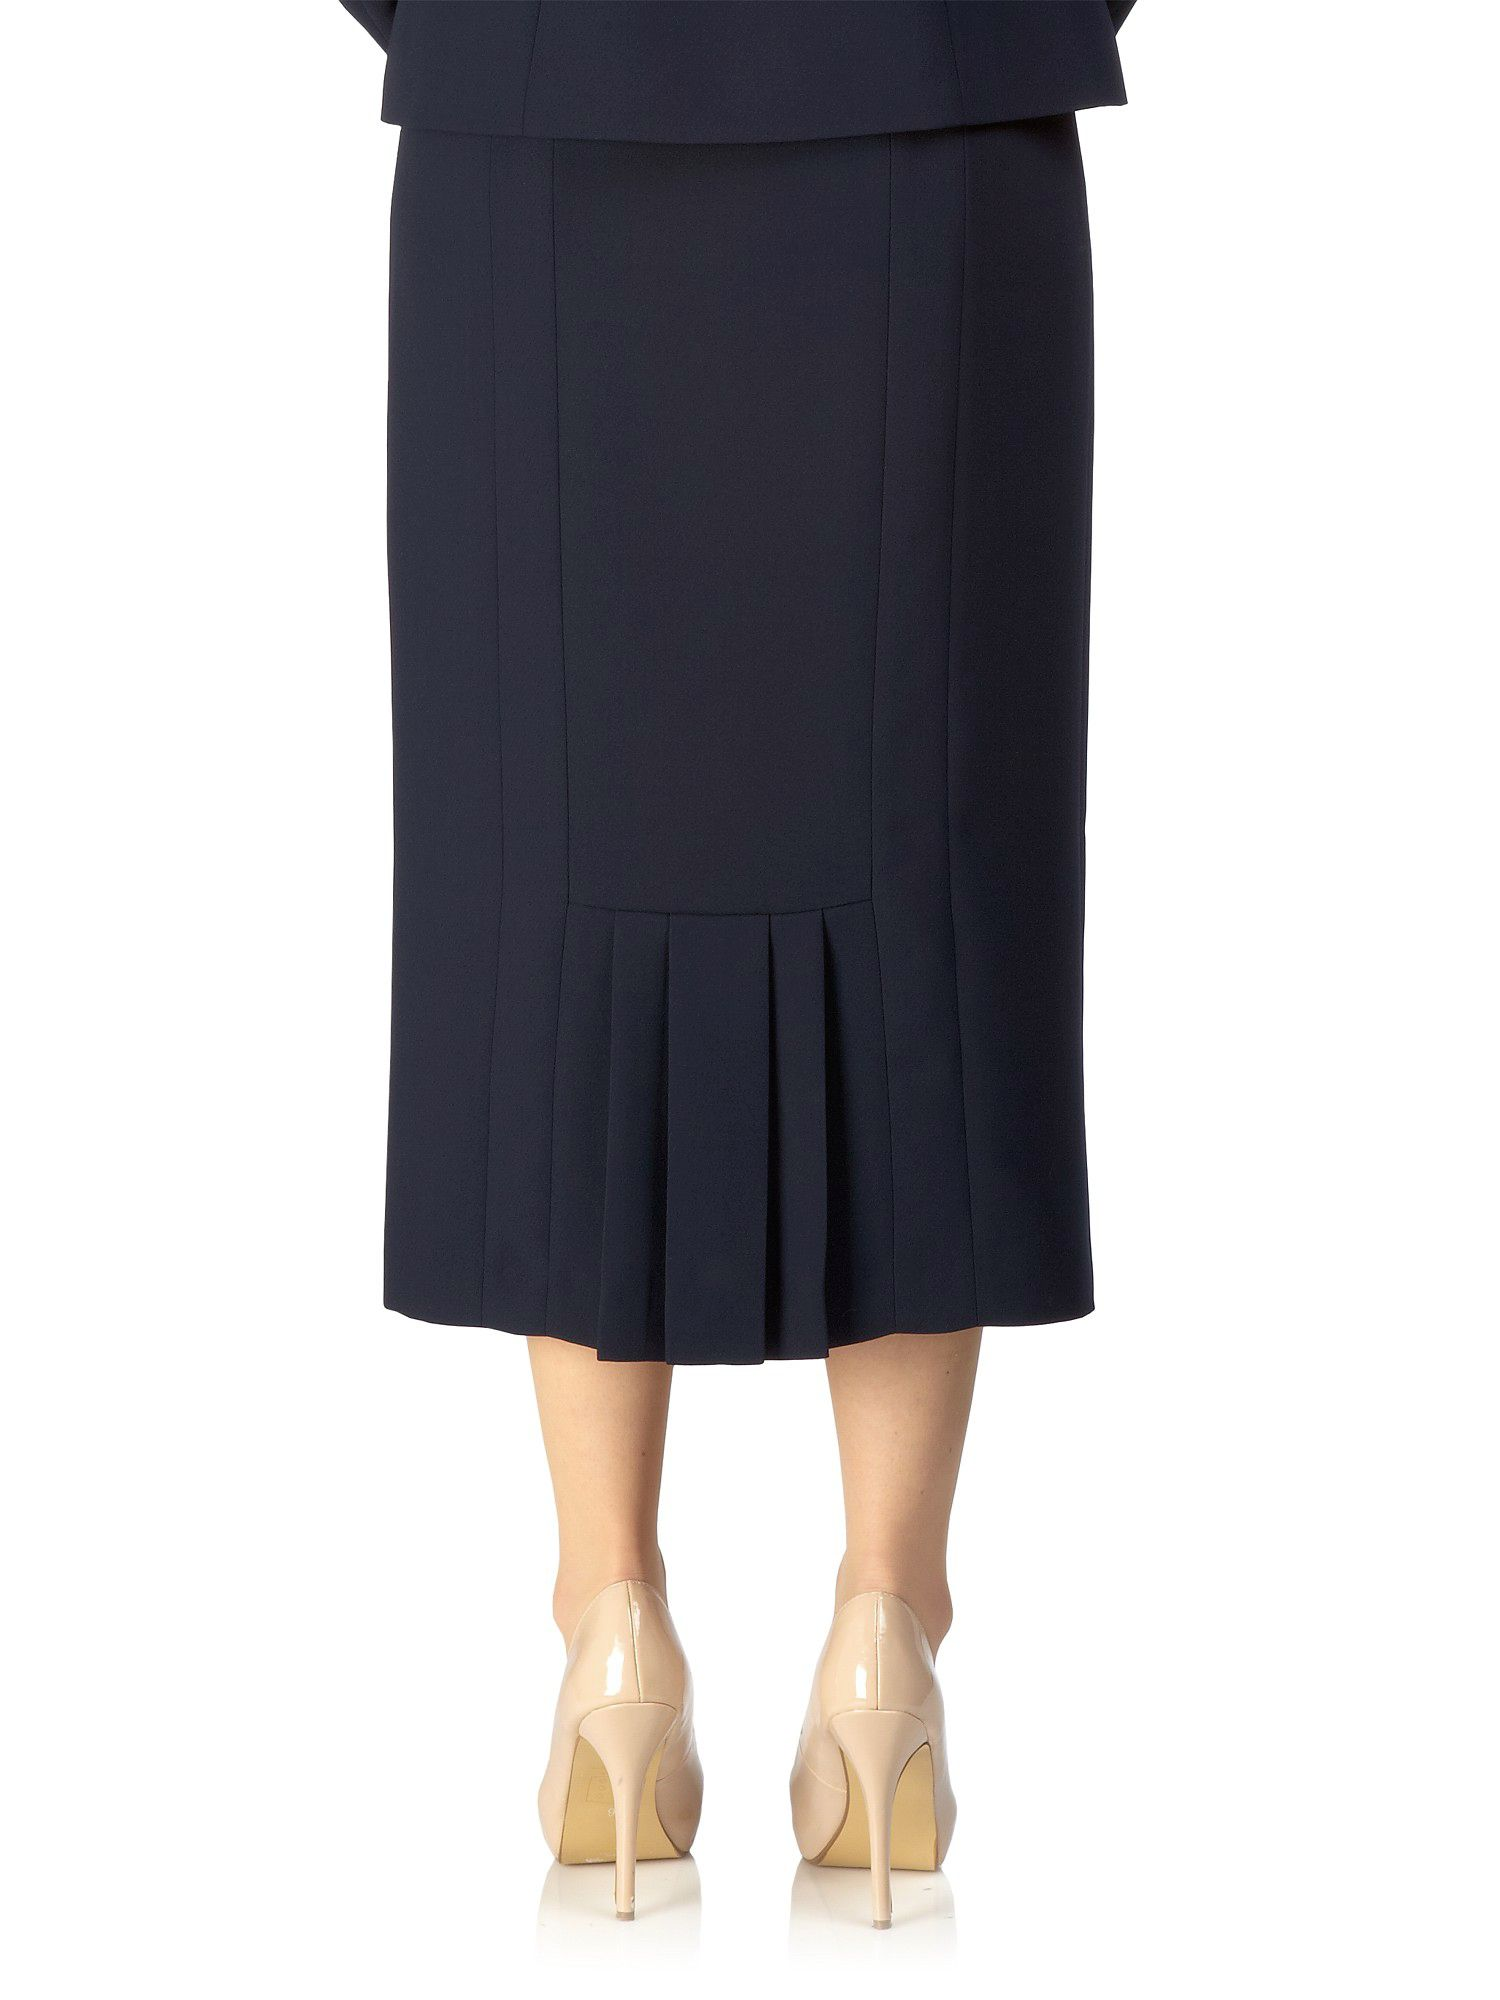 Petite Navy Pencil Skirt - Skirts